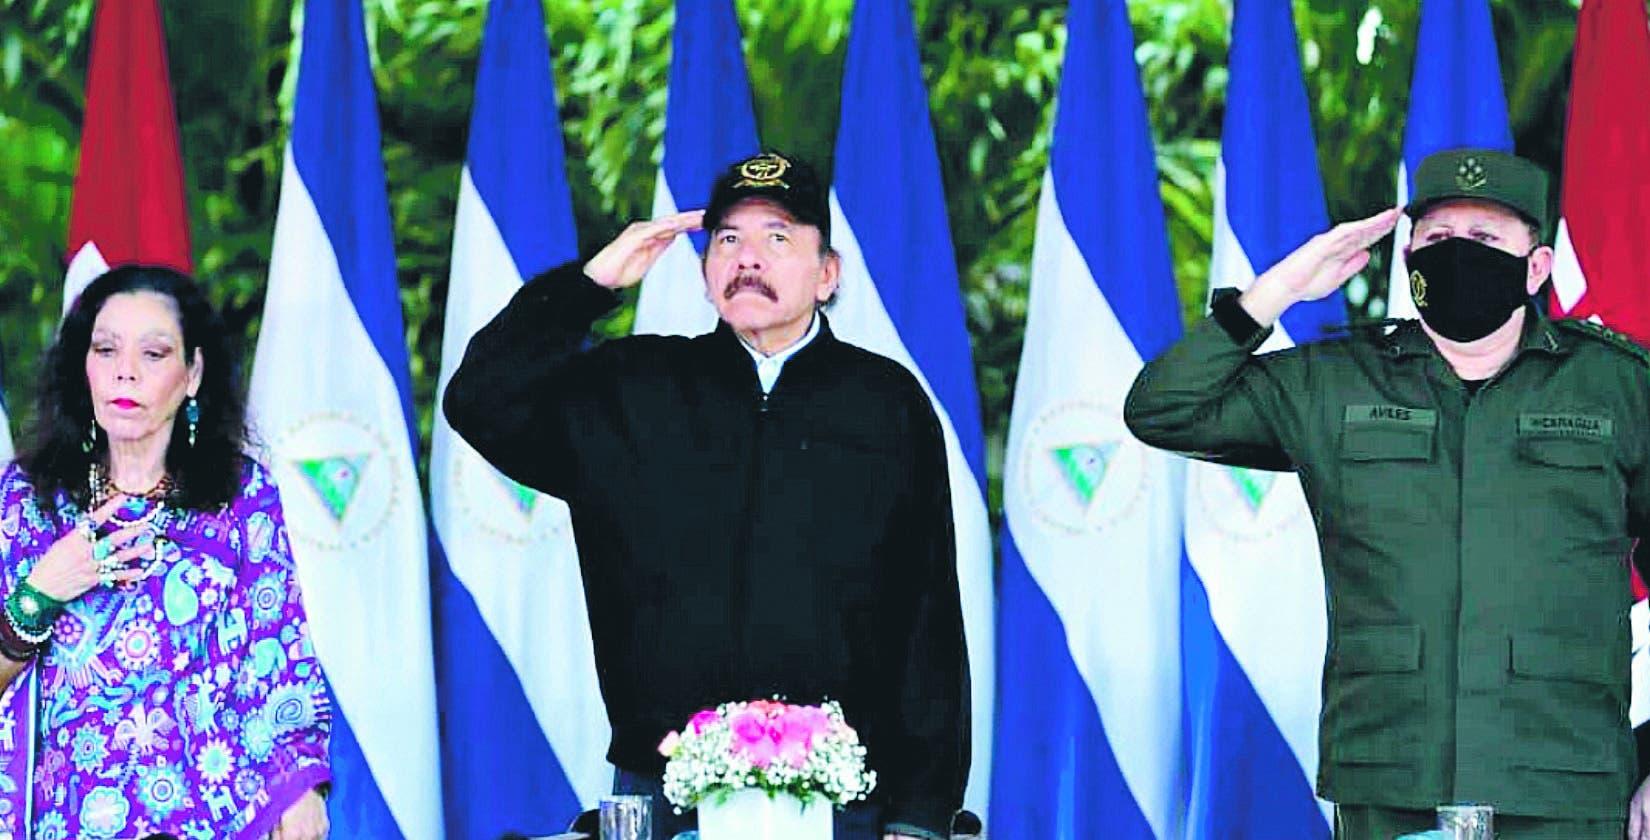 Daniel Ortega busca  reelección arrestando a candidatos